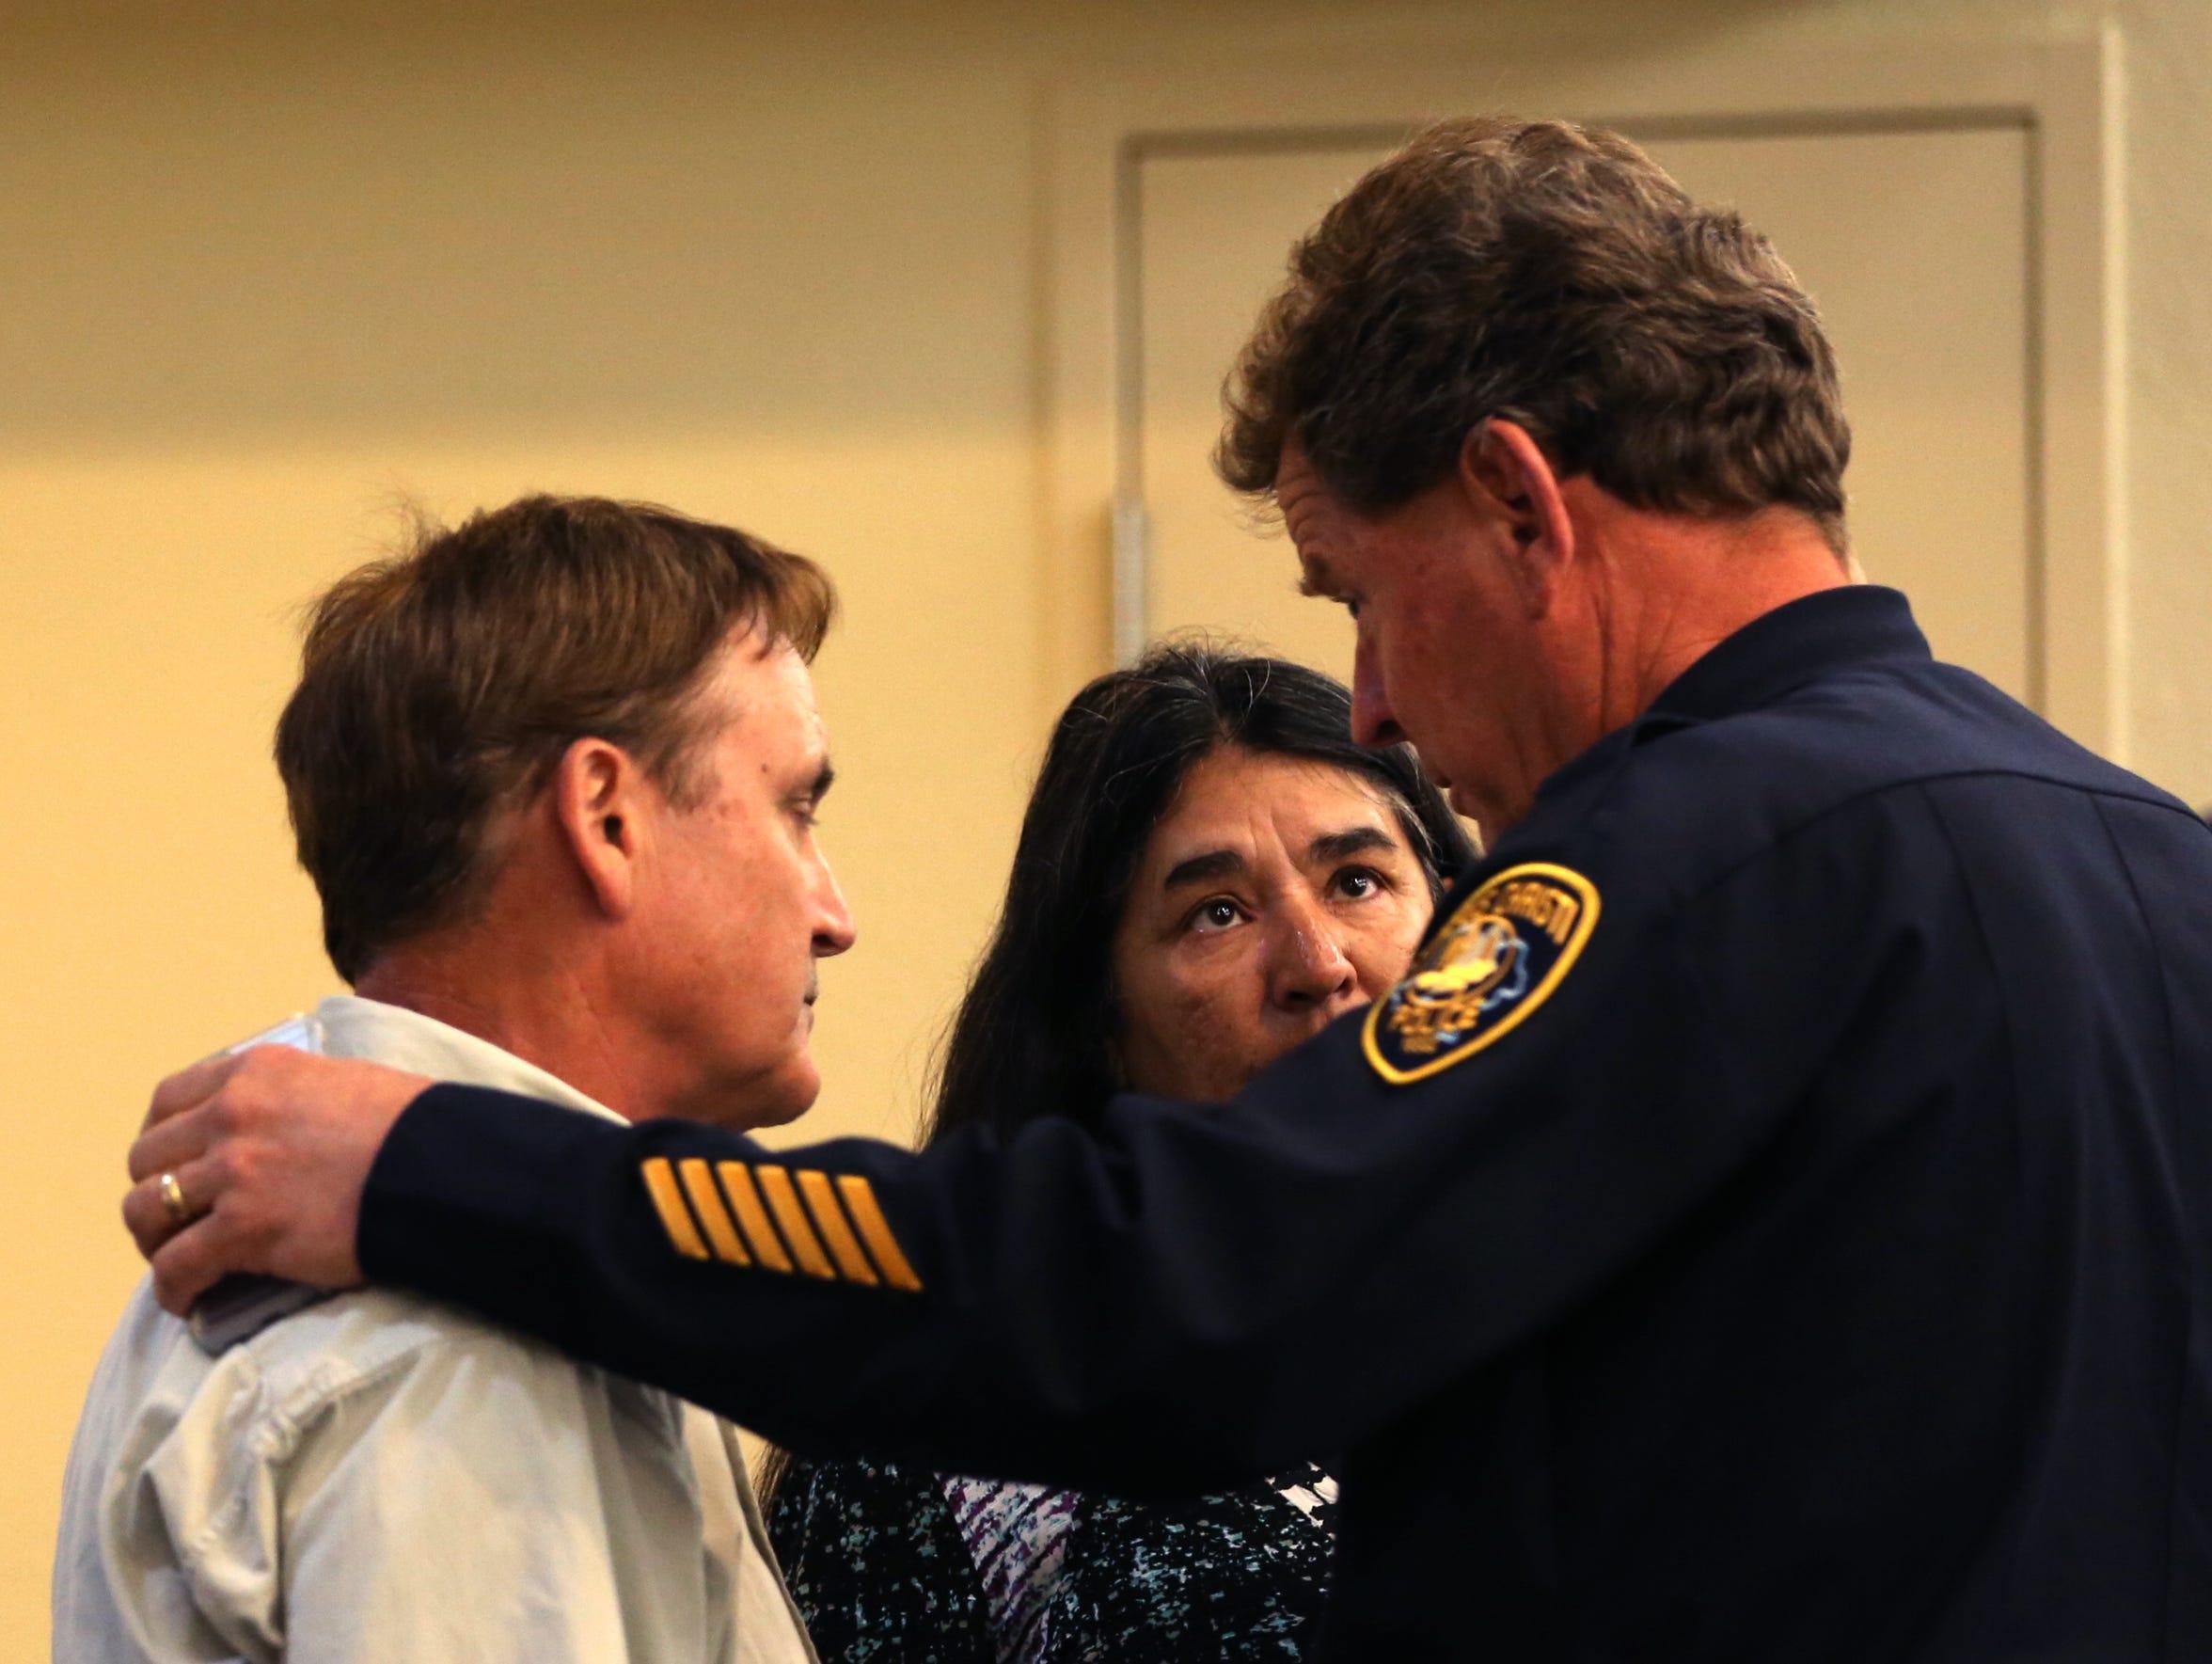 Gregg Fuqua (from left) and Sheila Fuqua talk with